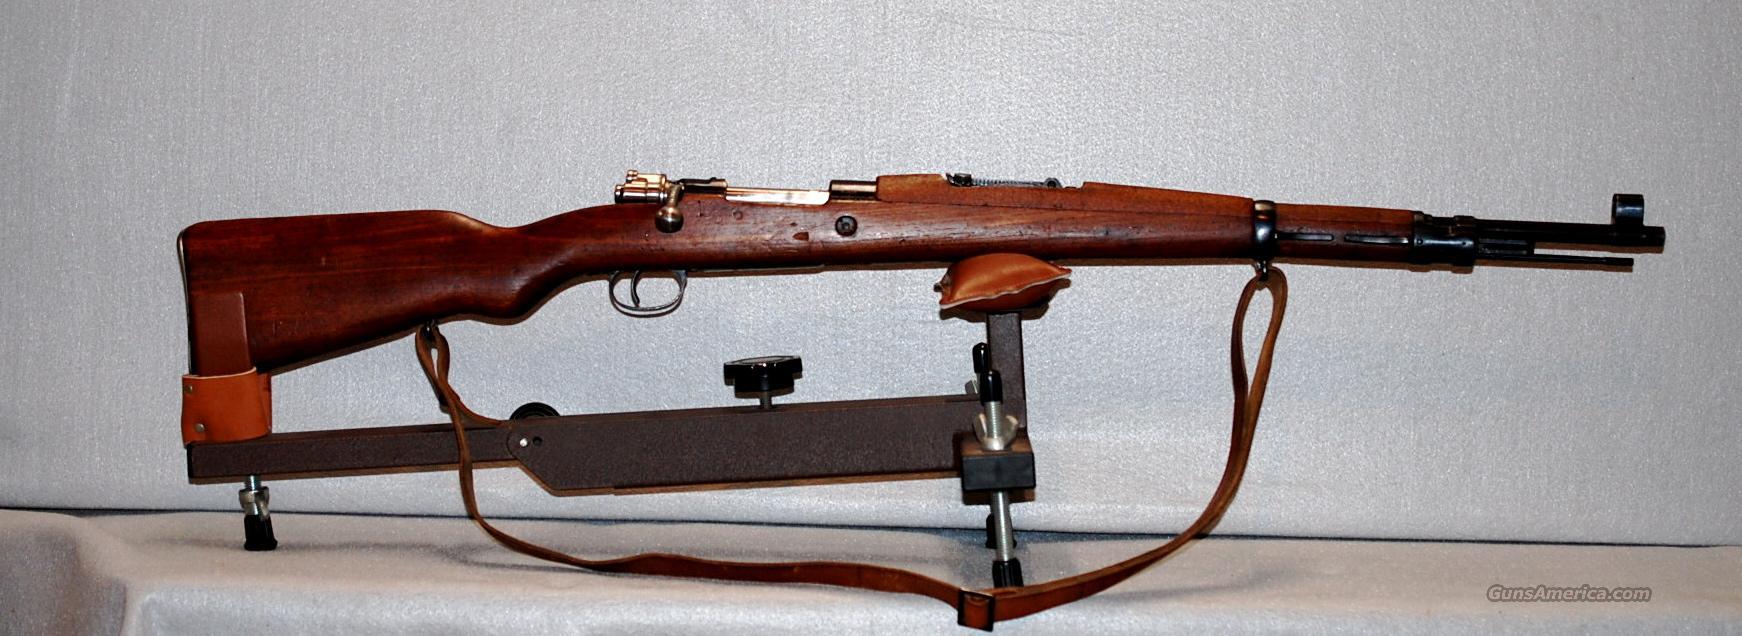 Yugo Mauser M24/47  Guns > Rifles > Mauser Rifles > German